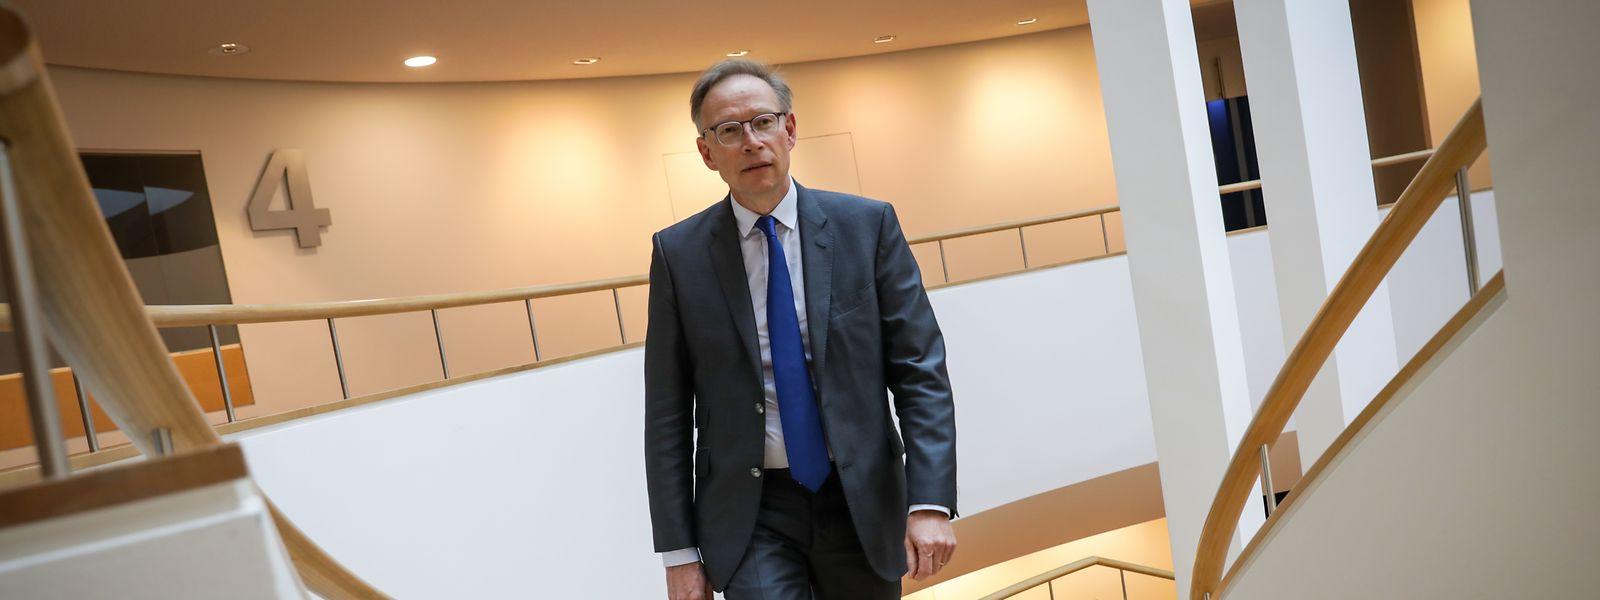 Geoffrey Bazin, CEO de BGL BNP Paribas.